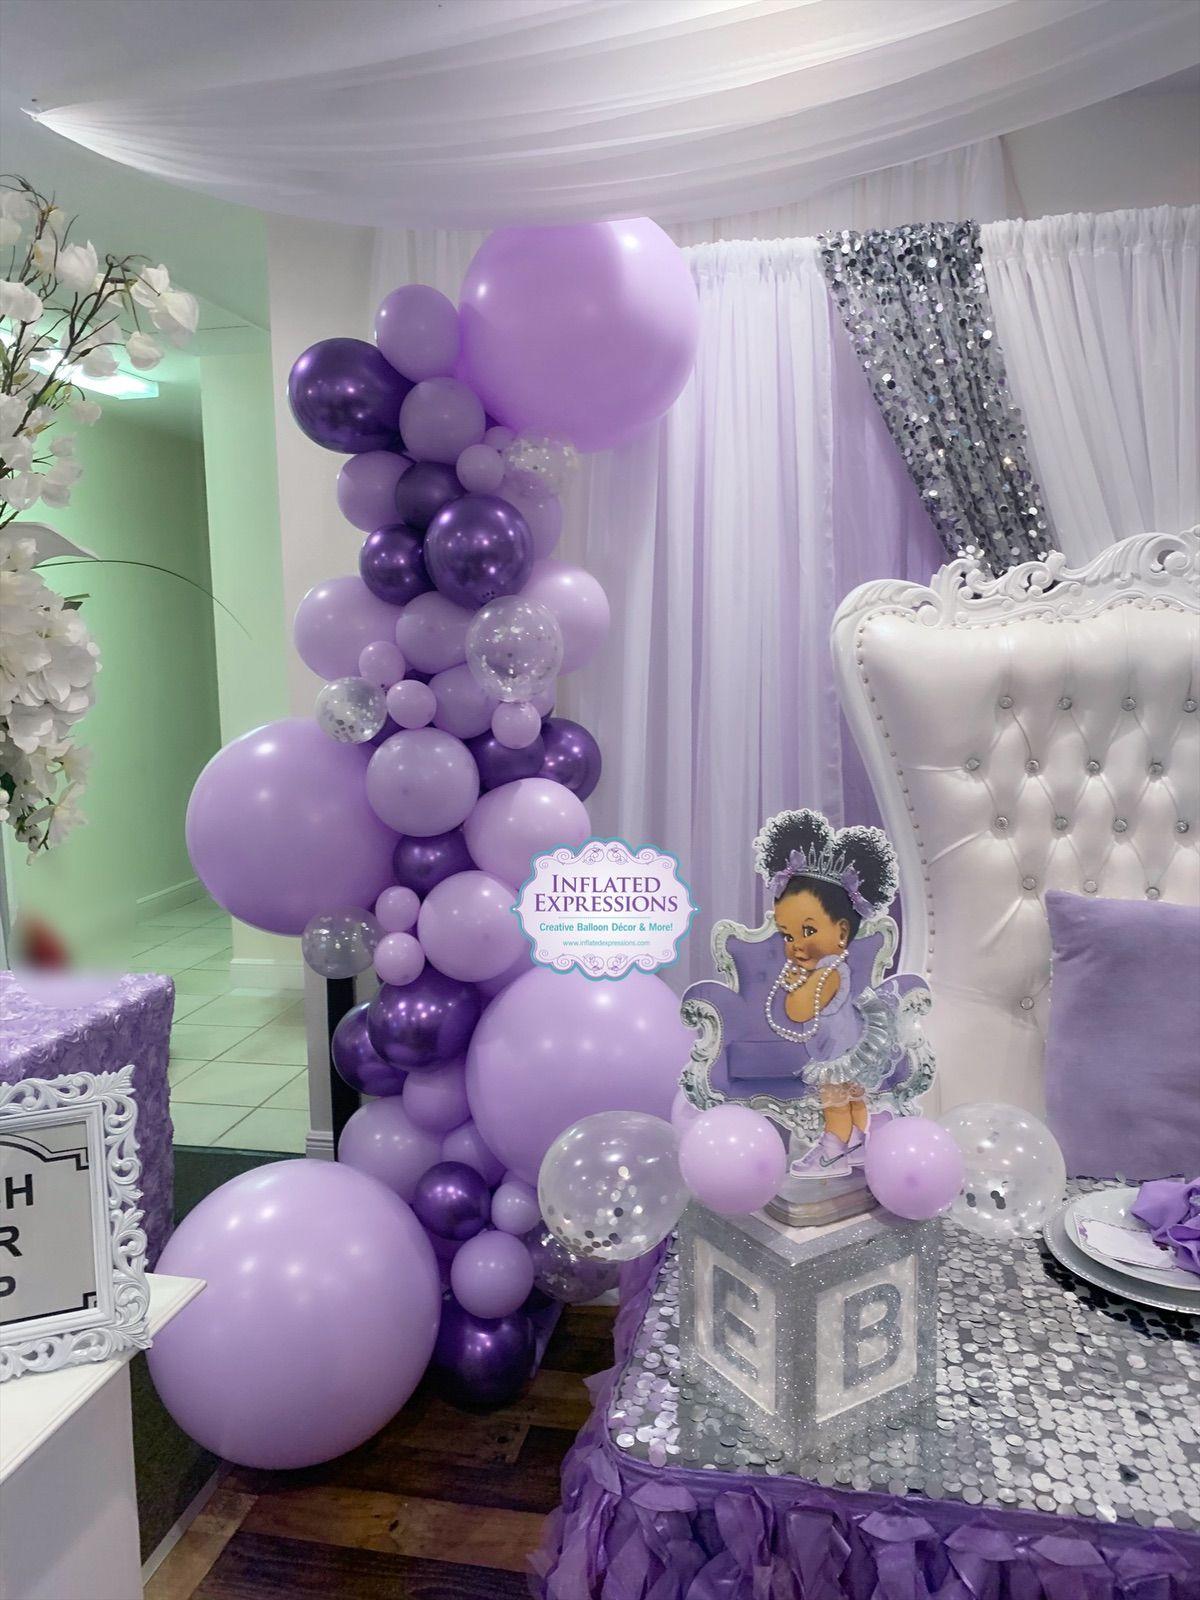 Purple Baby Shower Themes For Girls : purple, shower, themes, girls, Organic, Balloon, Garland, Column, Shower, Decorations, Themes,, Decorations,, Lavender, Showers